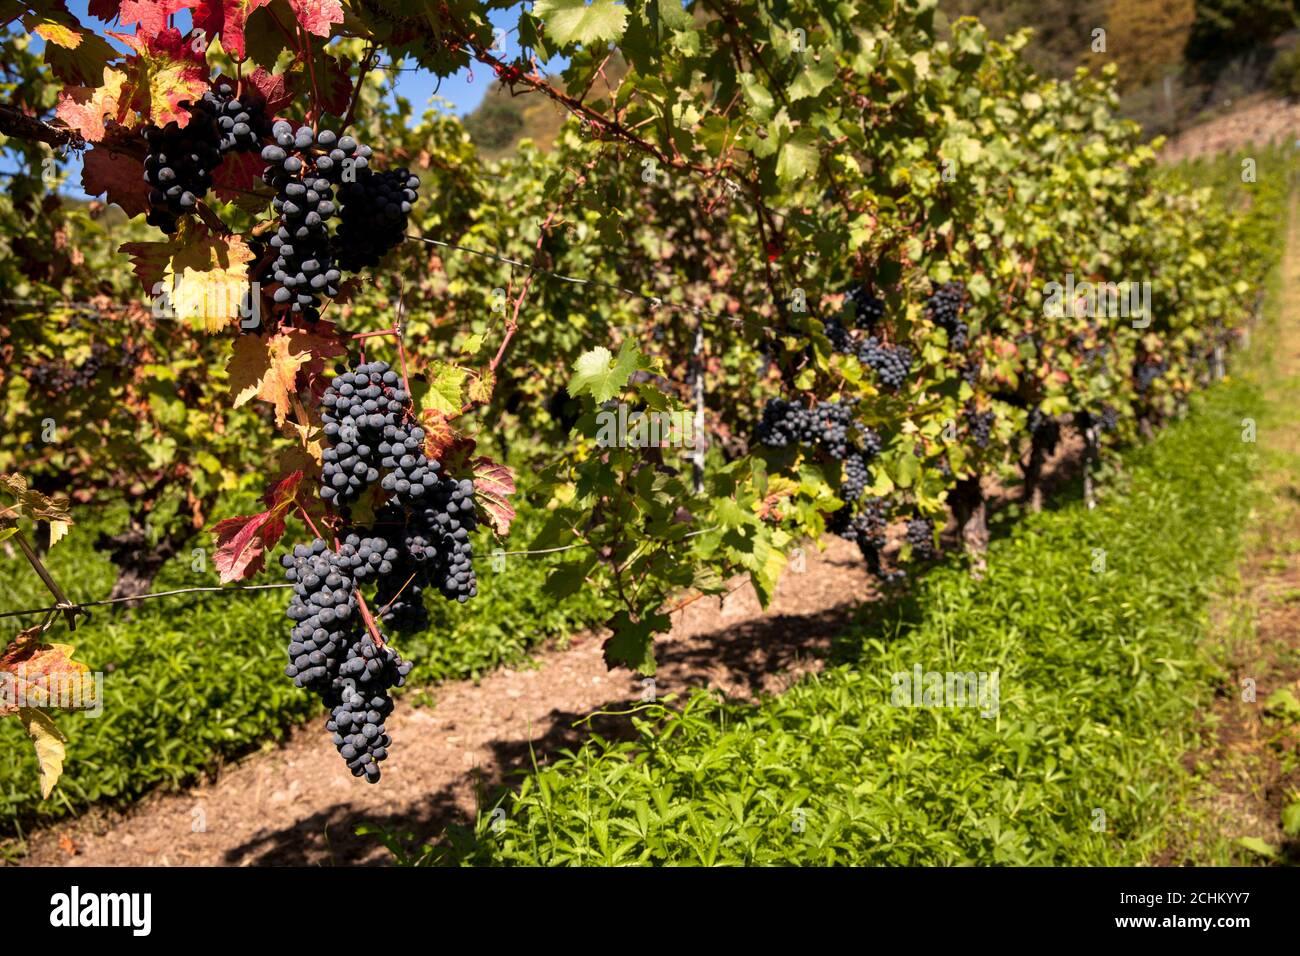 winegrowing at the Drachenfels hill between Koenigswinter and Bad Honnef, red wine grapes, North Rhine-Westphalia, Germany.  Weinanbau am Drachenfels Stock Photo